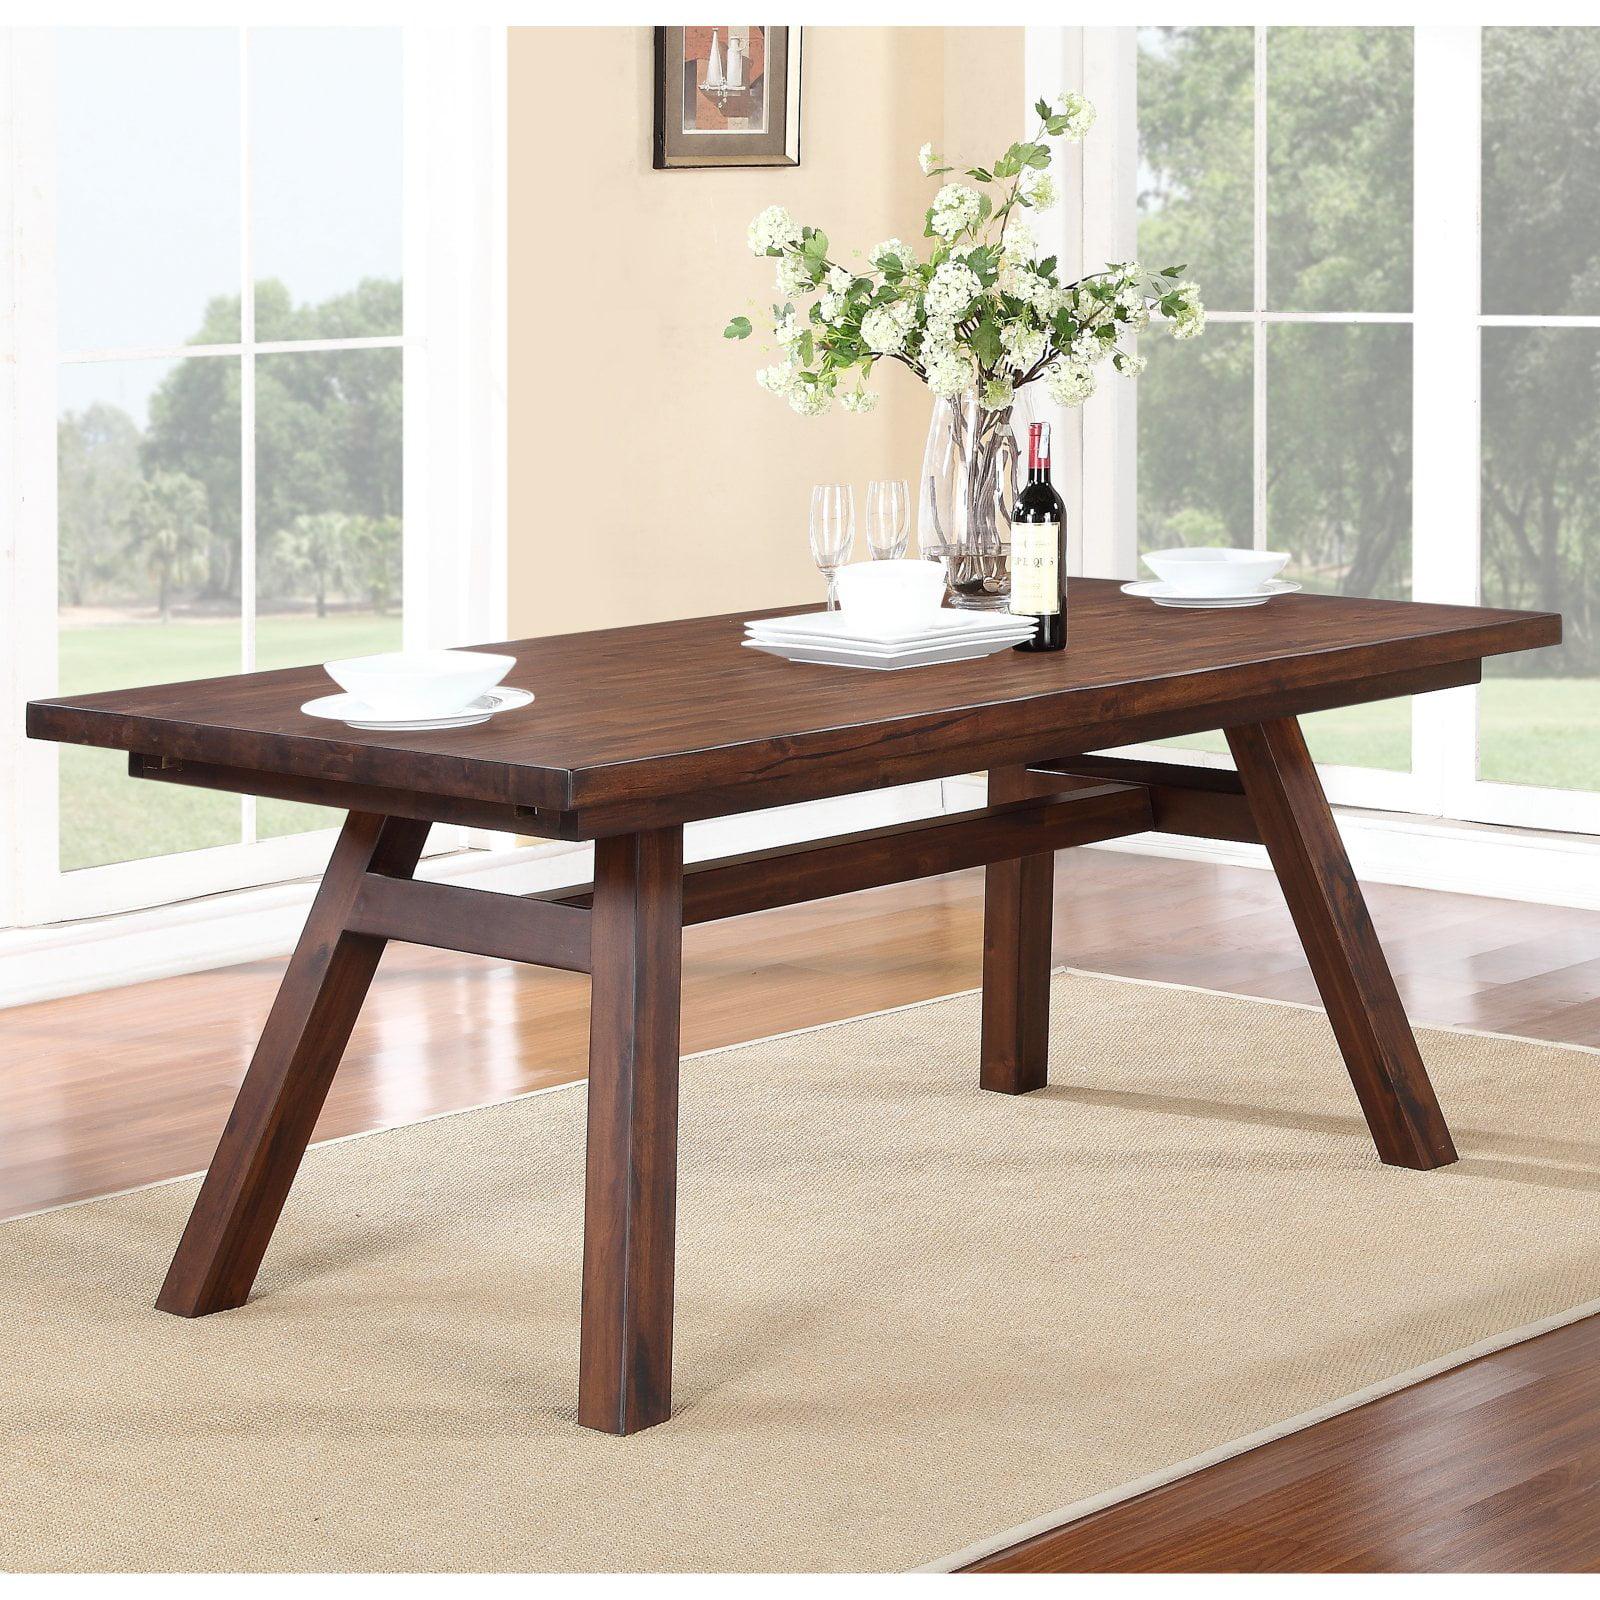 Modus Portland Solid Wood Rectangular Extension Table Medium Walnut by Modus Furniture International